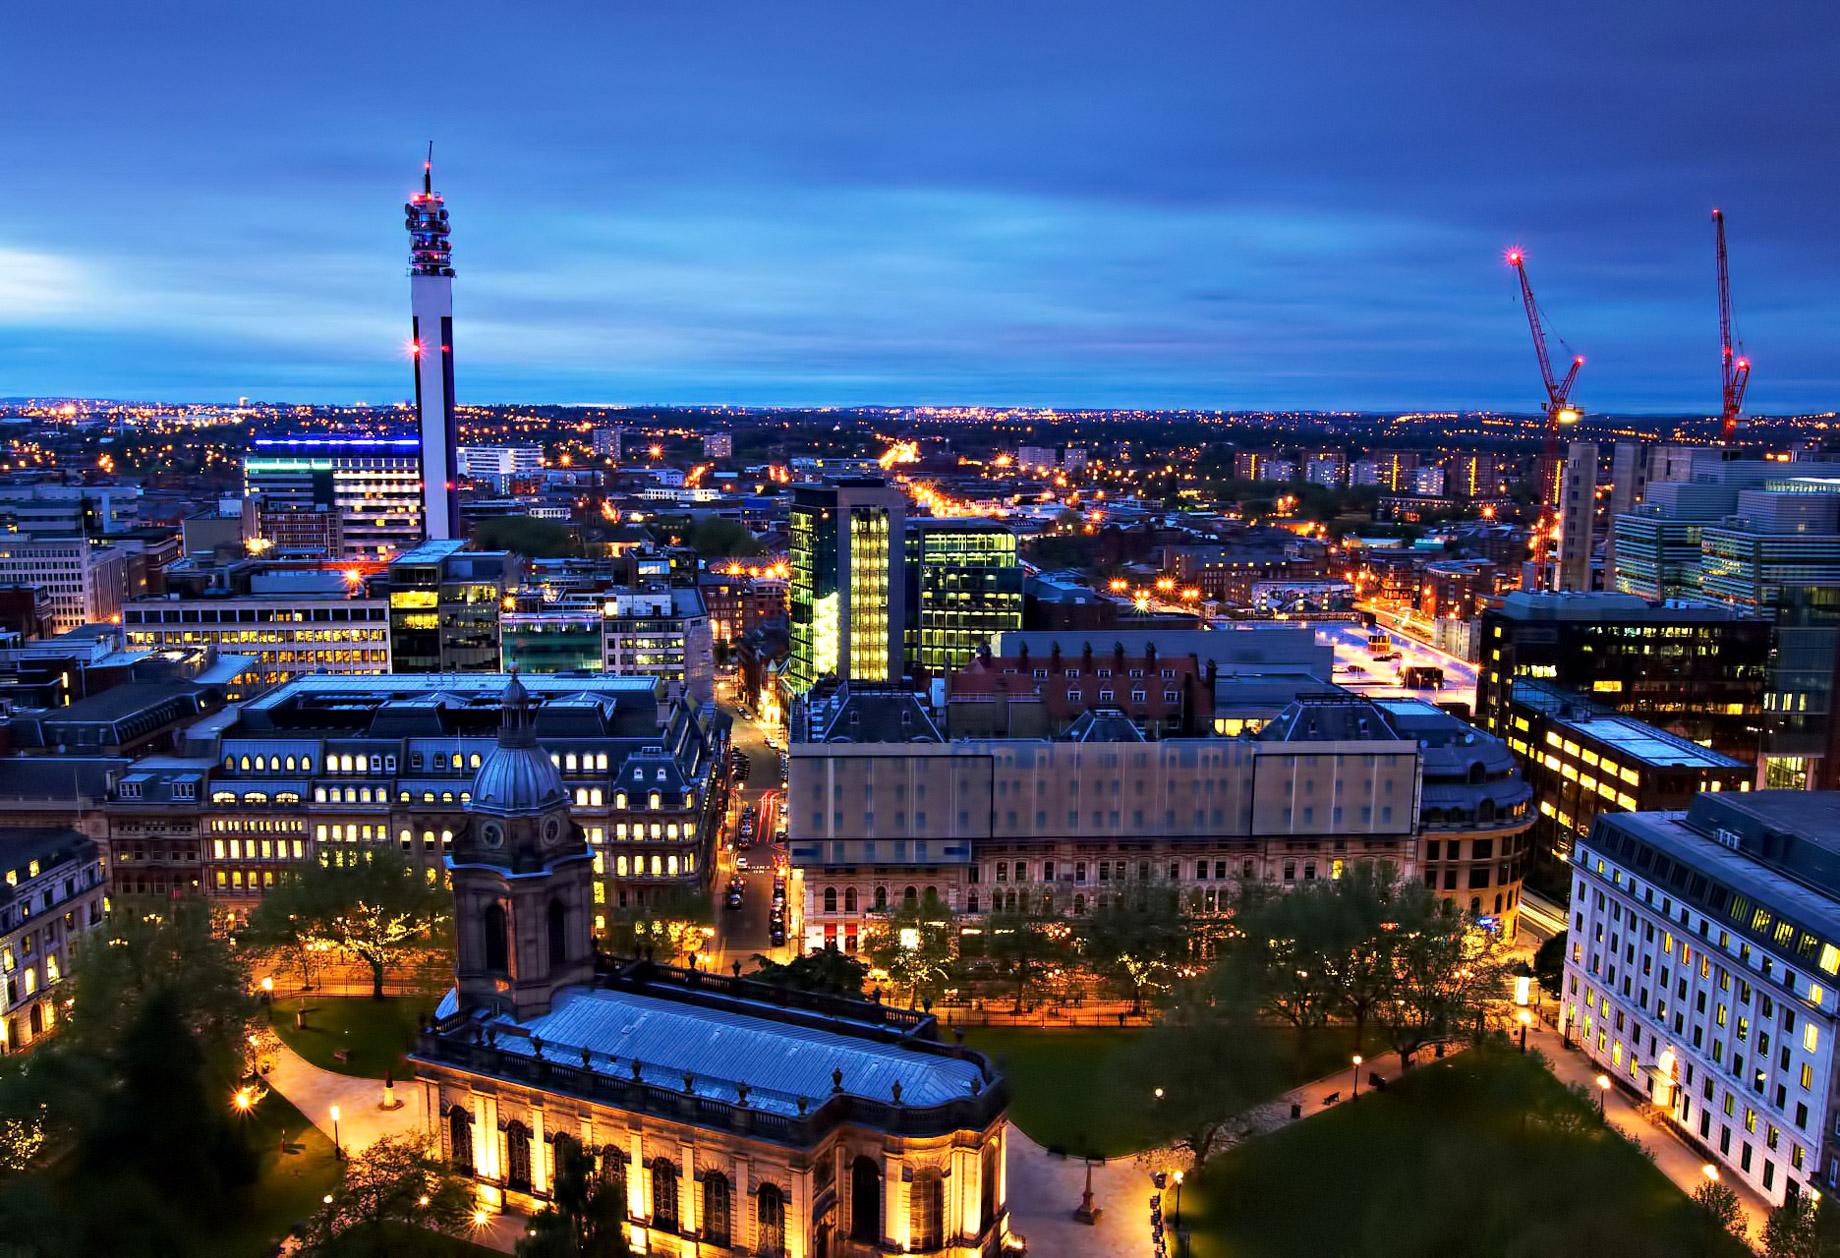 Birmingham - UK Property Investment Opportunities